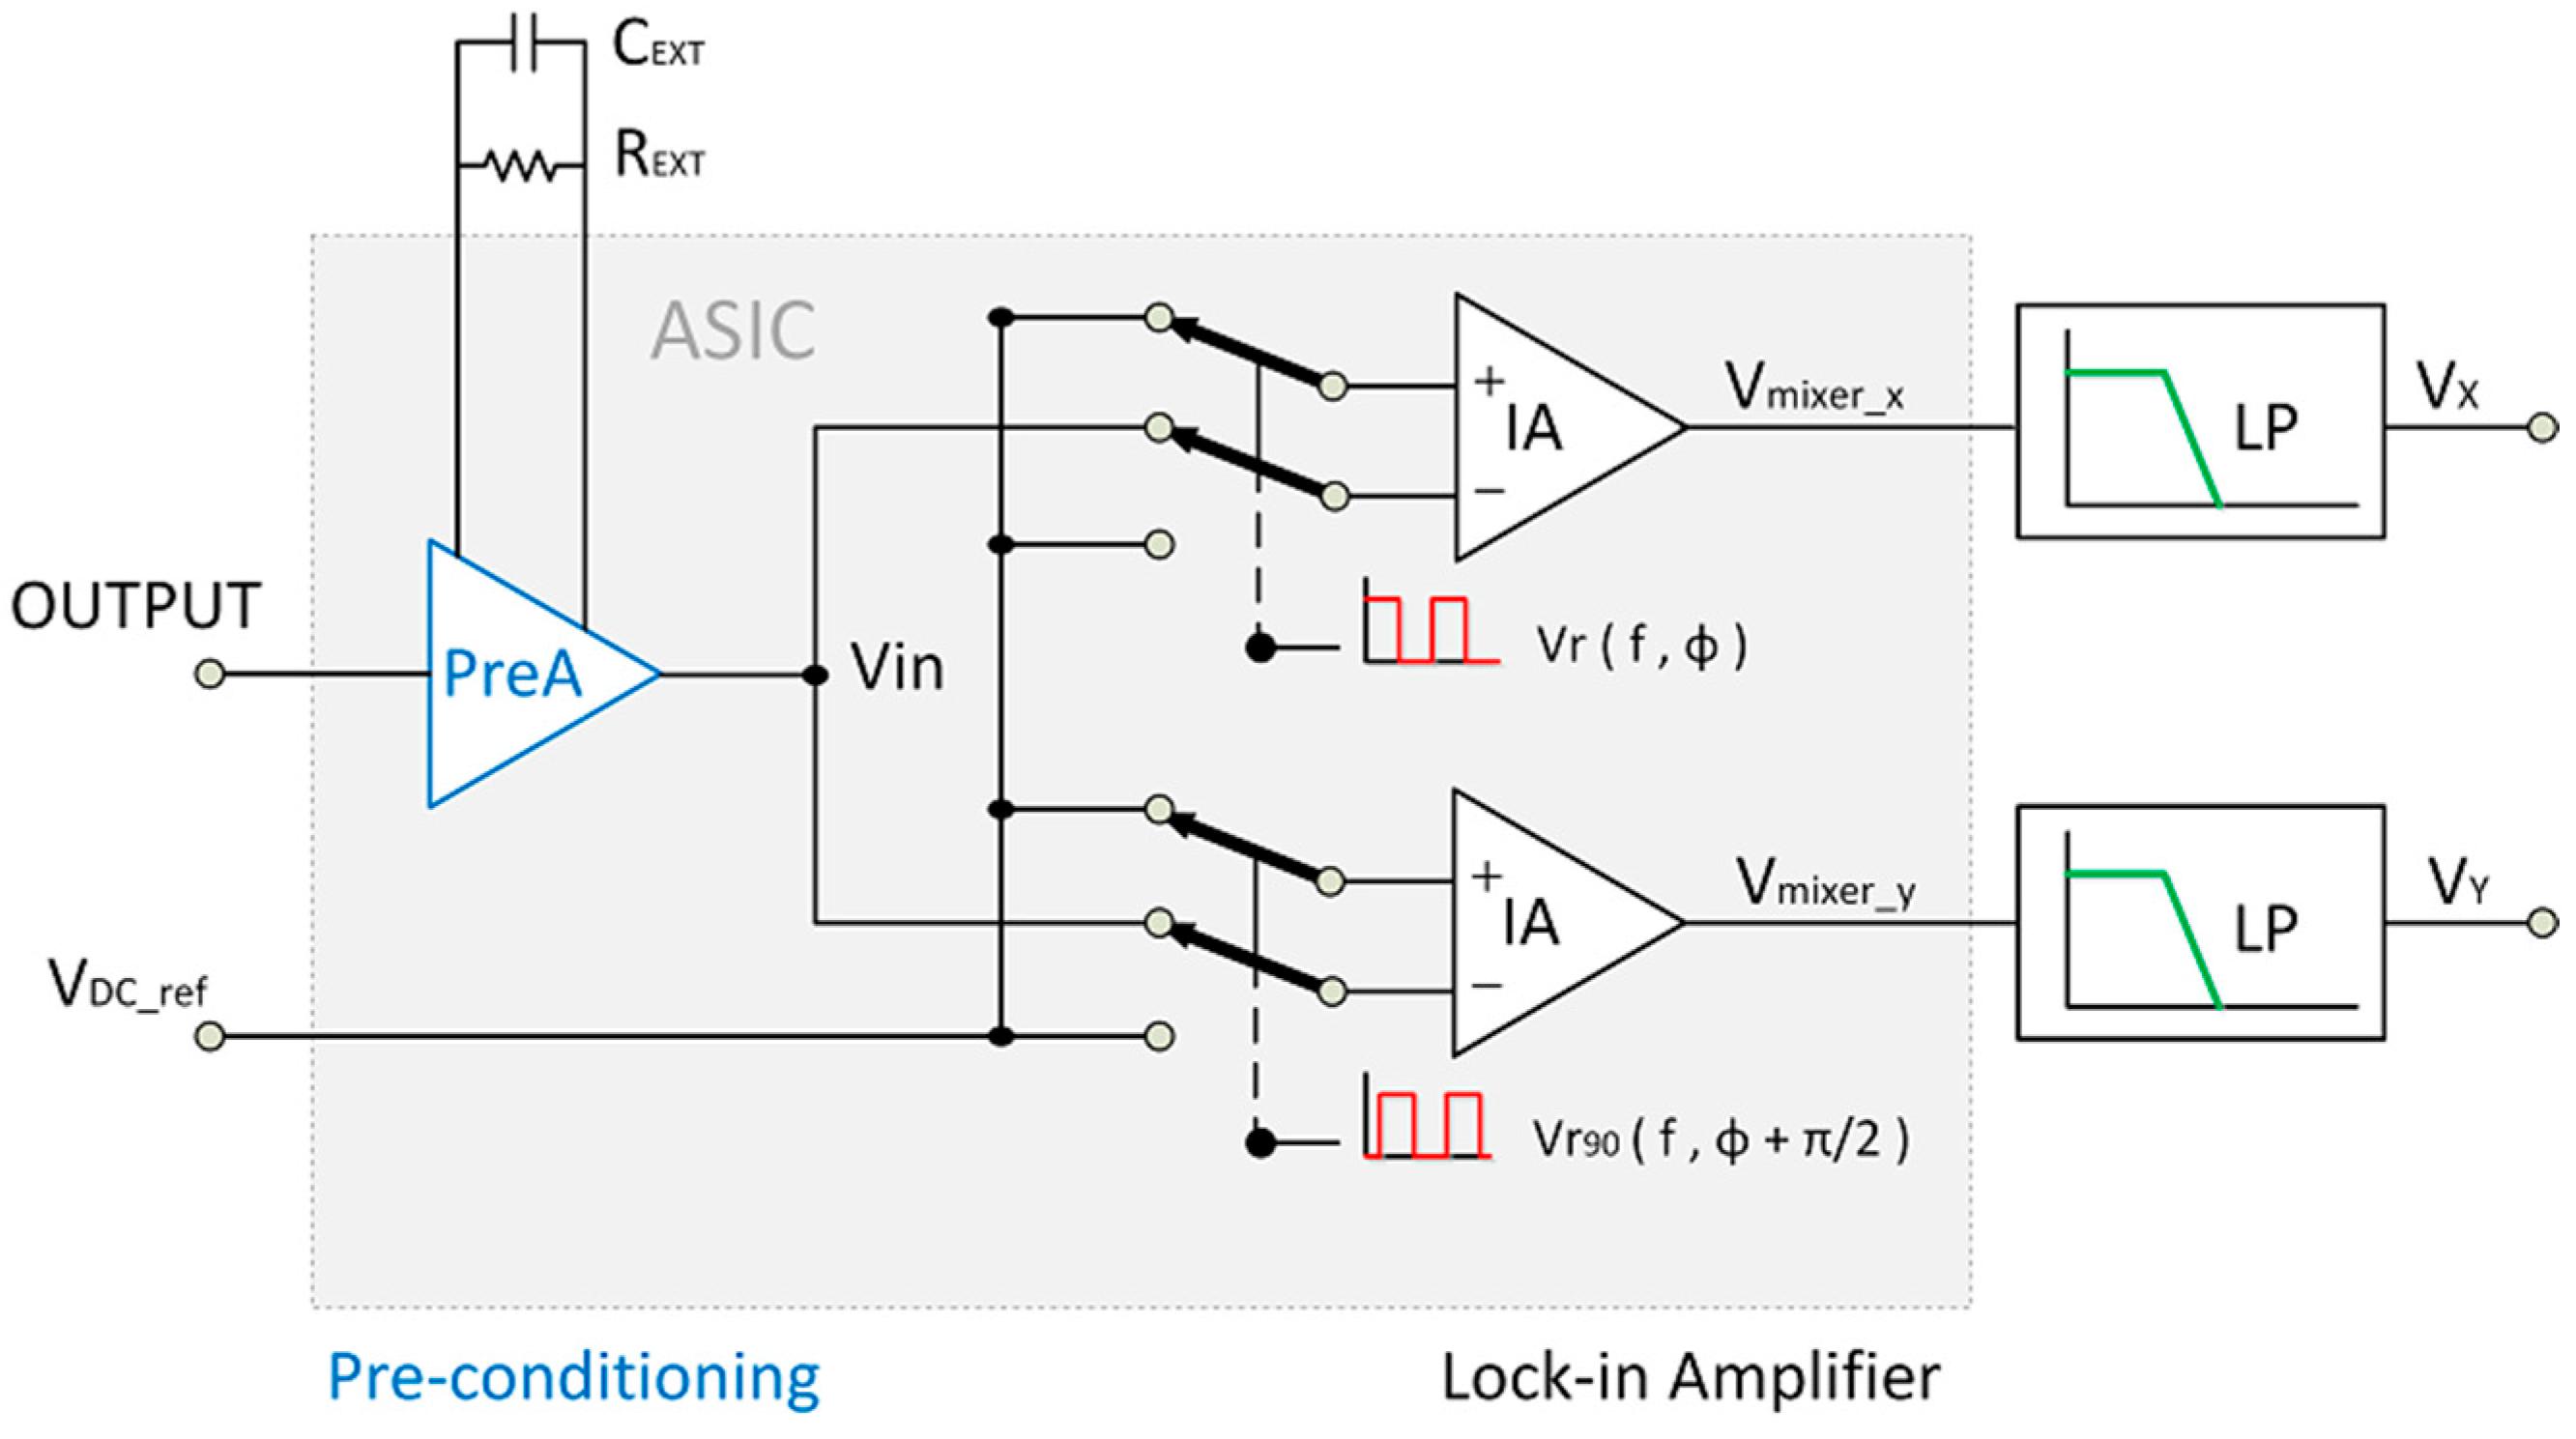 Sensors Free Full Text A High Performance Lia Based Interface 1mhz Quartz Crystal Oscillator Circuit Signalprocessing 15 25260 G002 1024